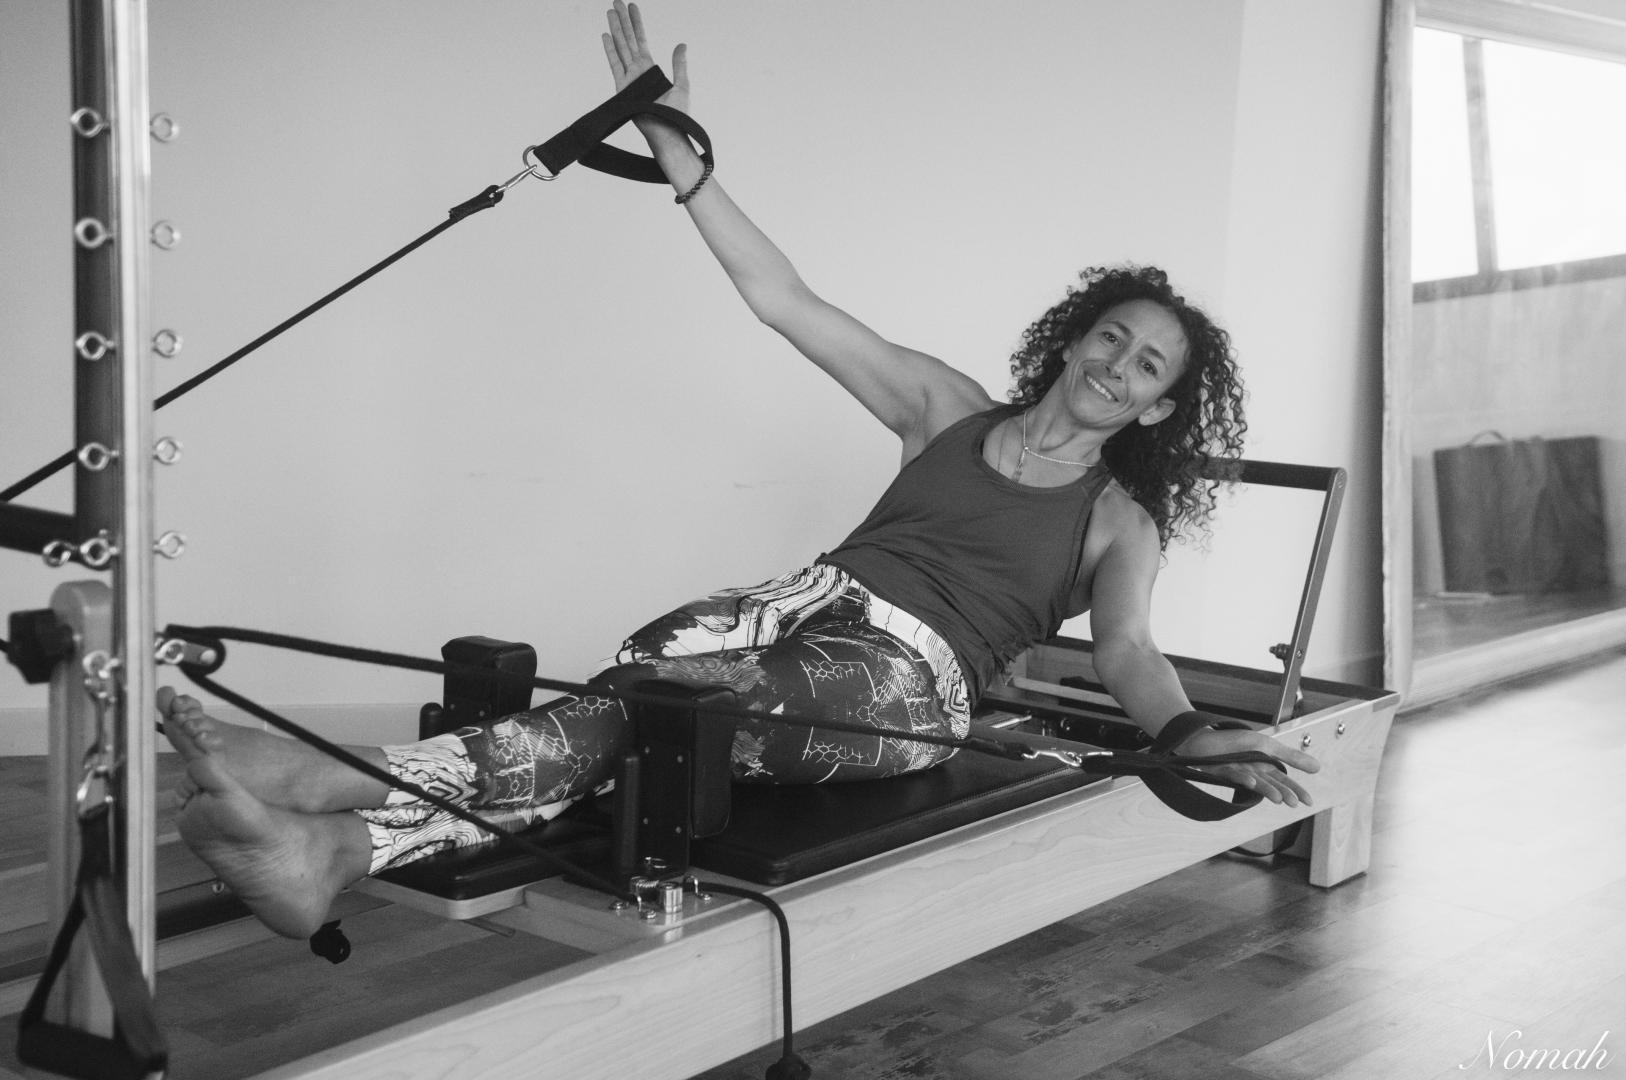 Souhila Yoga Pilates